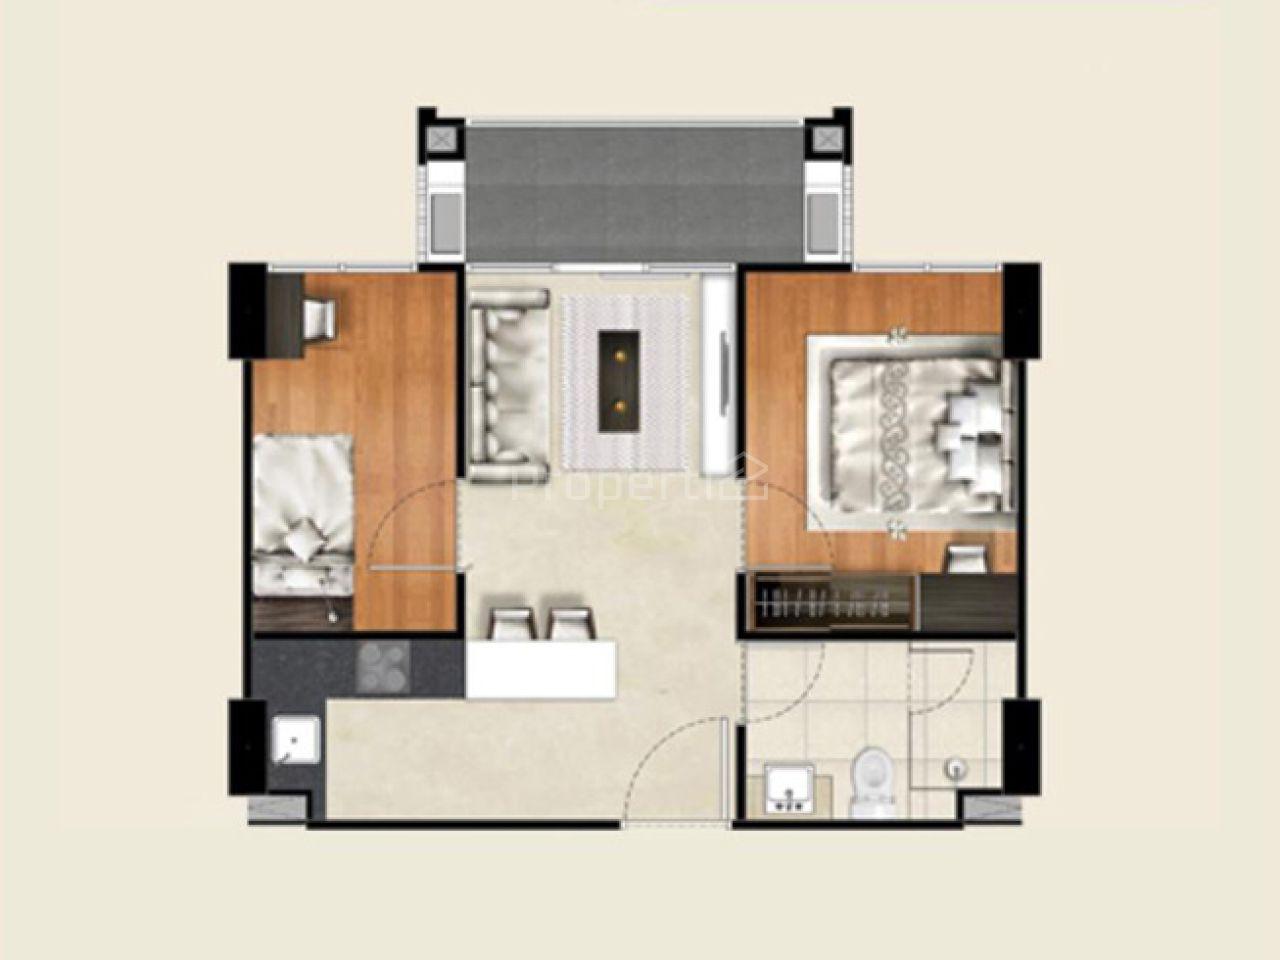 2BR Apartment Unit at Landmark Residence, 3th Floor, Cicendo